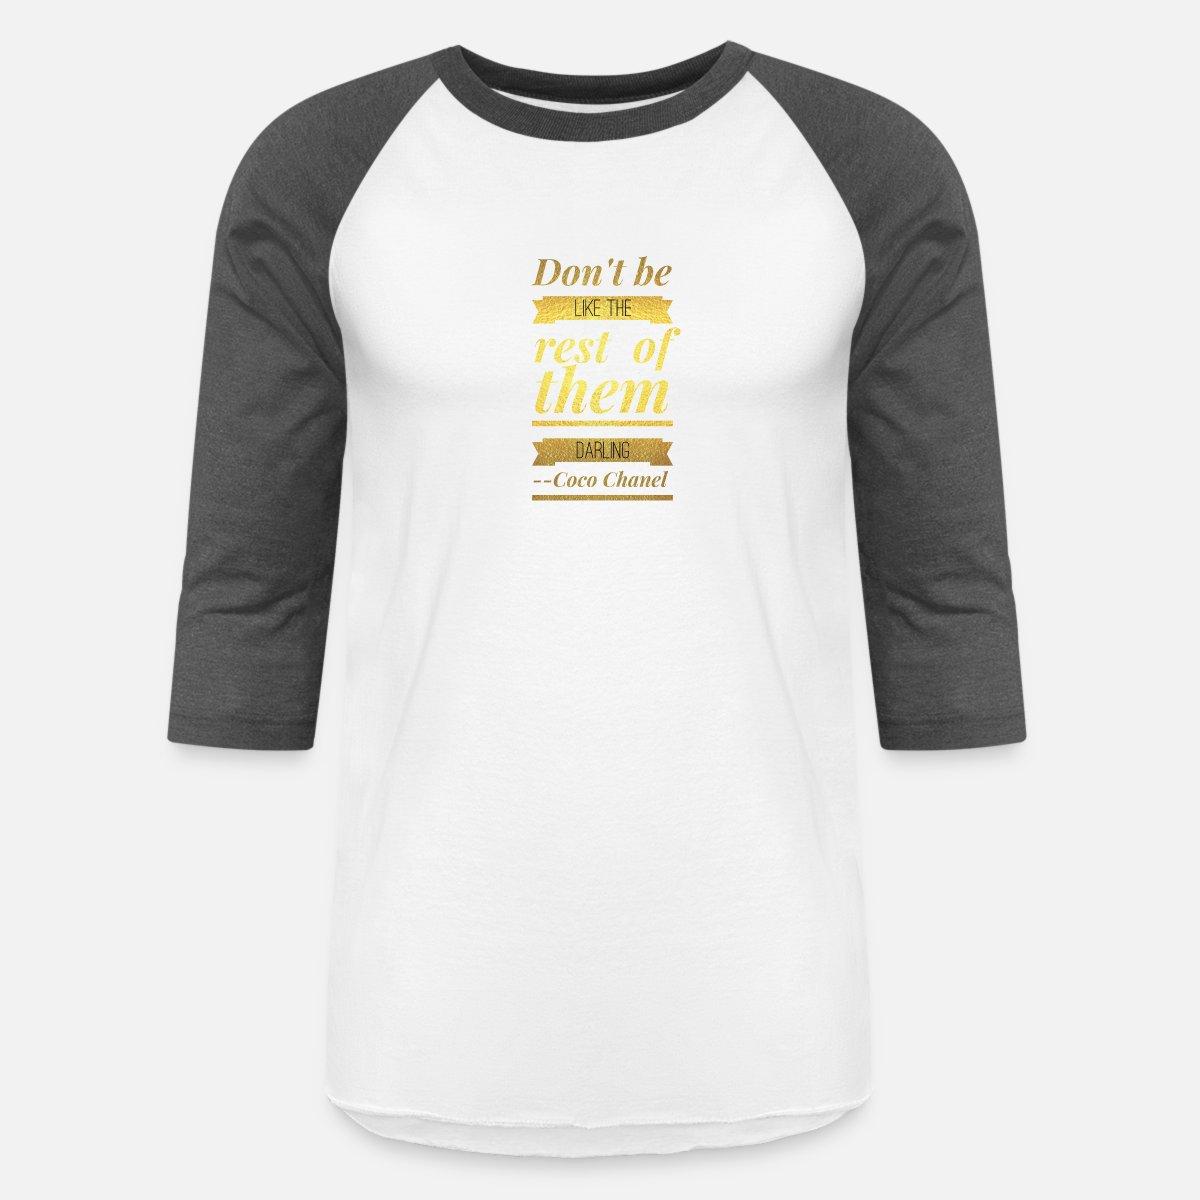 2f28b03986d6 ... coco chanel uni baseball t shirt spreadshirt ...